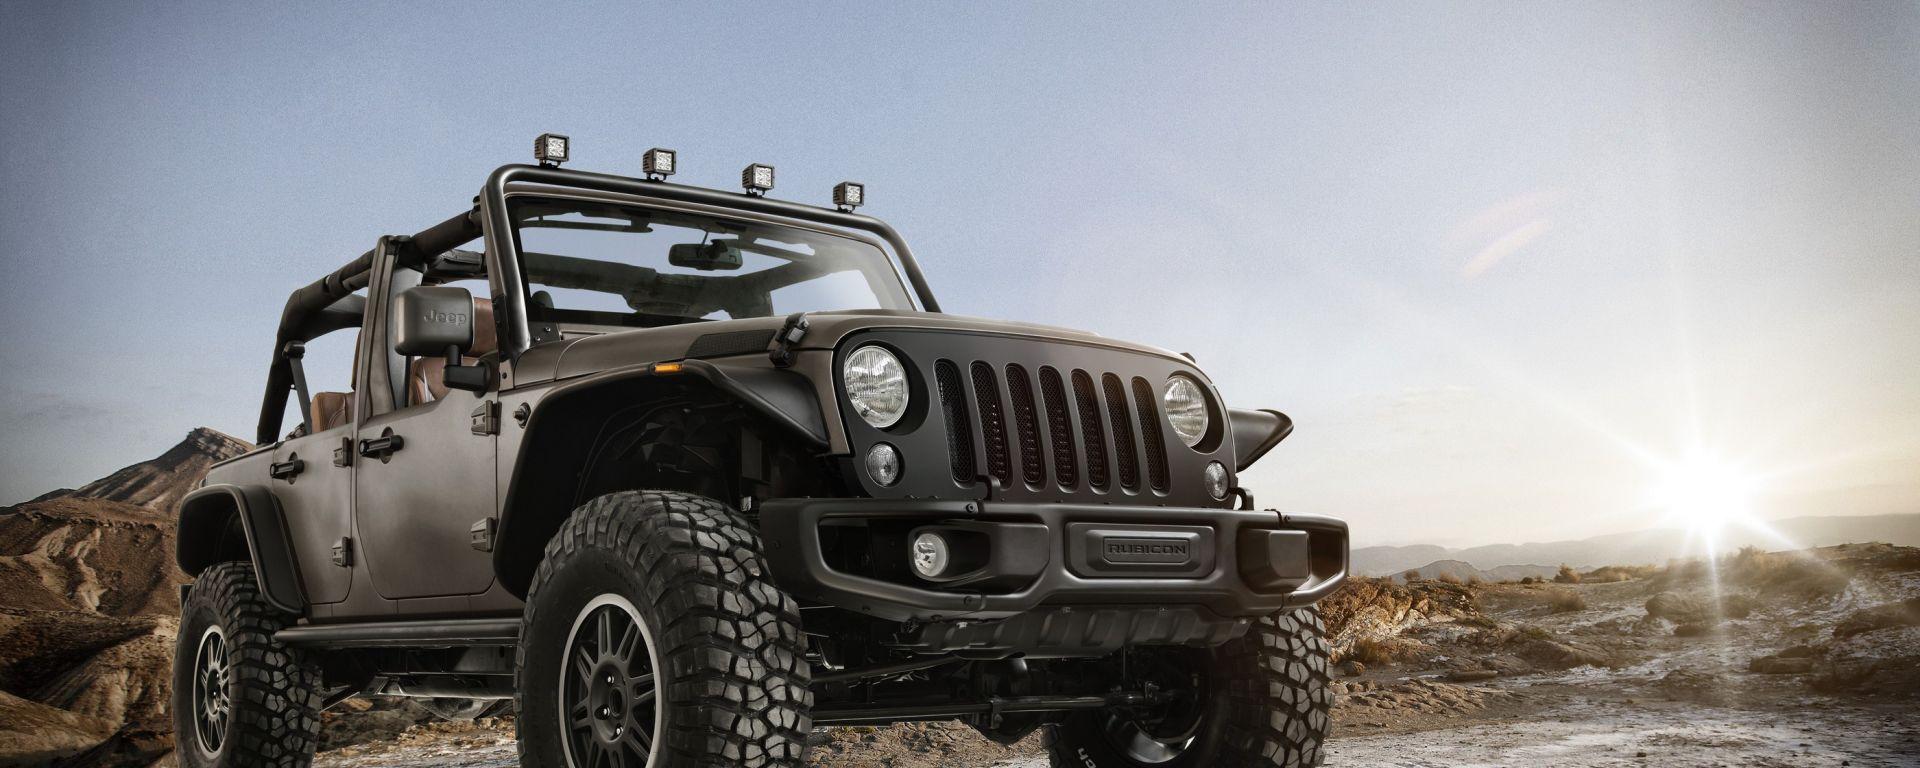 Jeep Wrangler Rubicon Stealth by Mopar